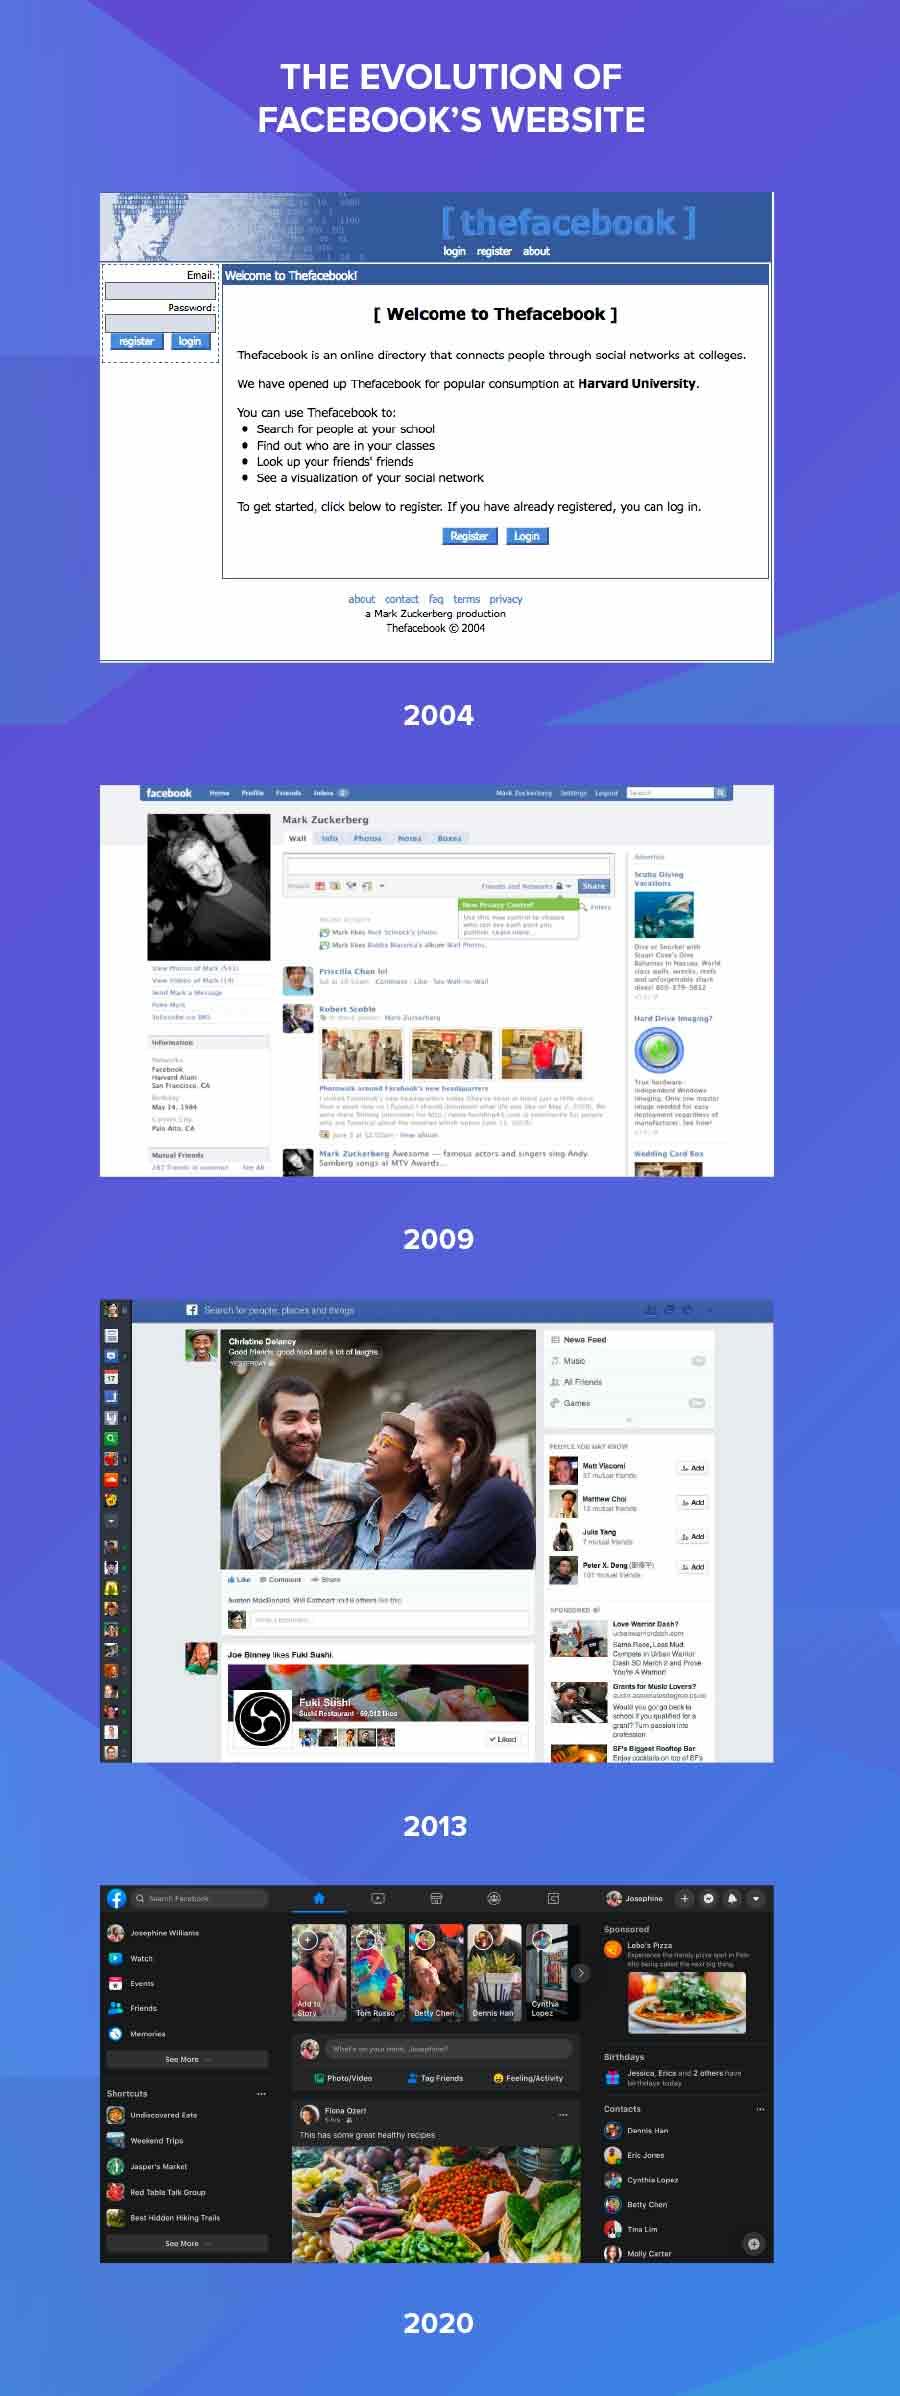 Modern website design: evolution of Facebook's interface